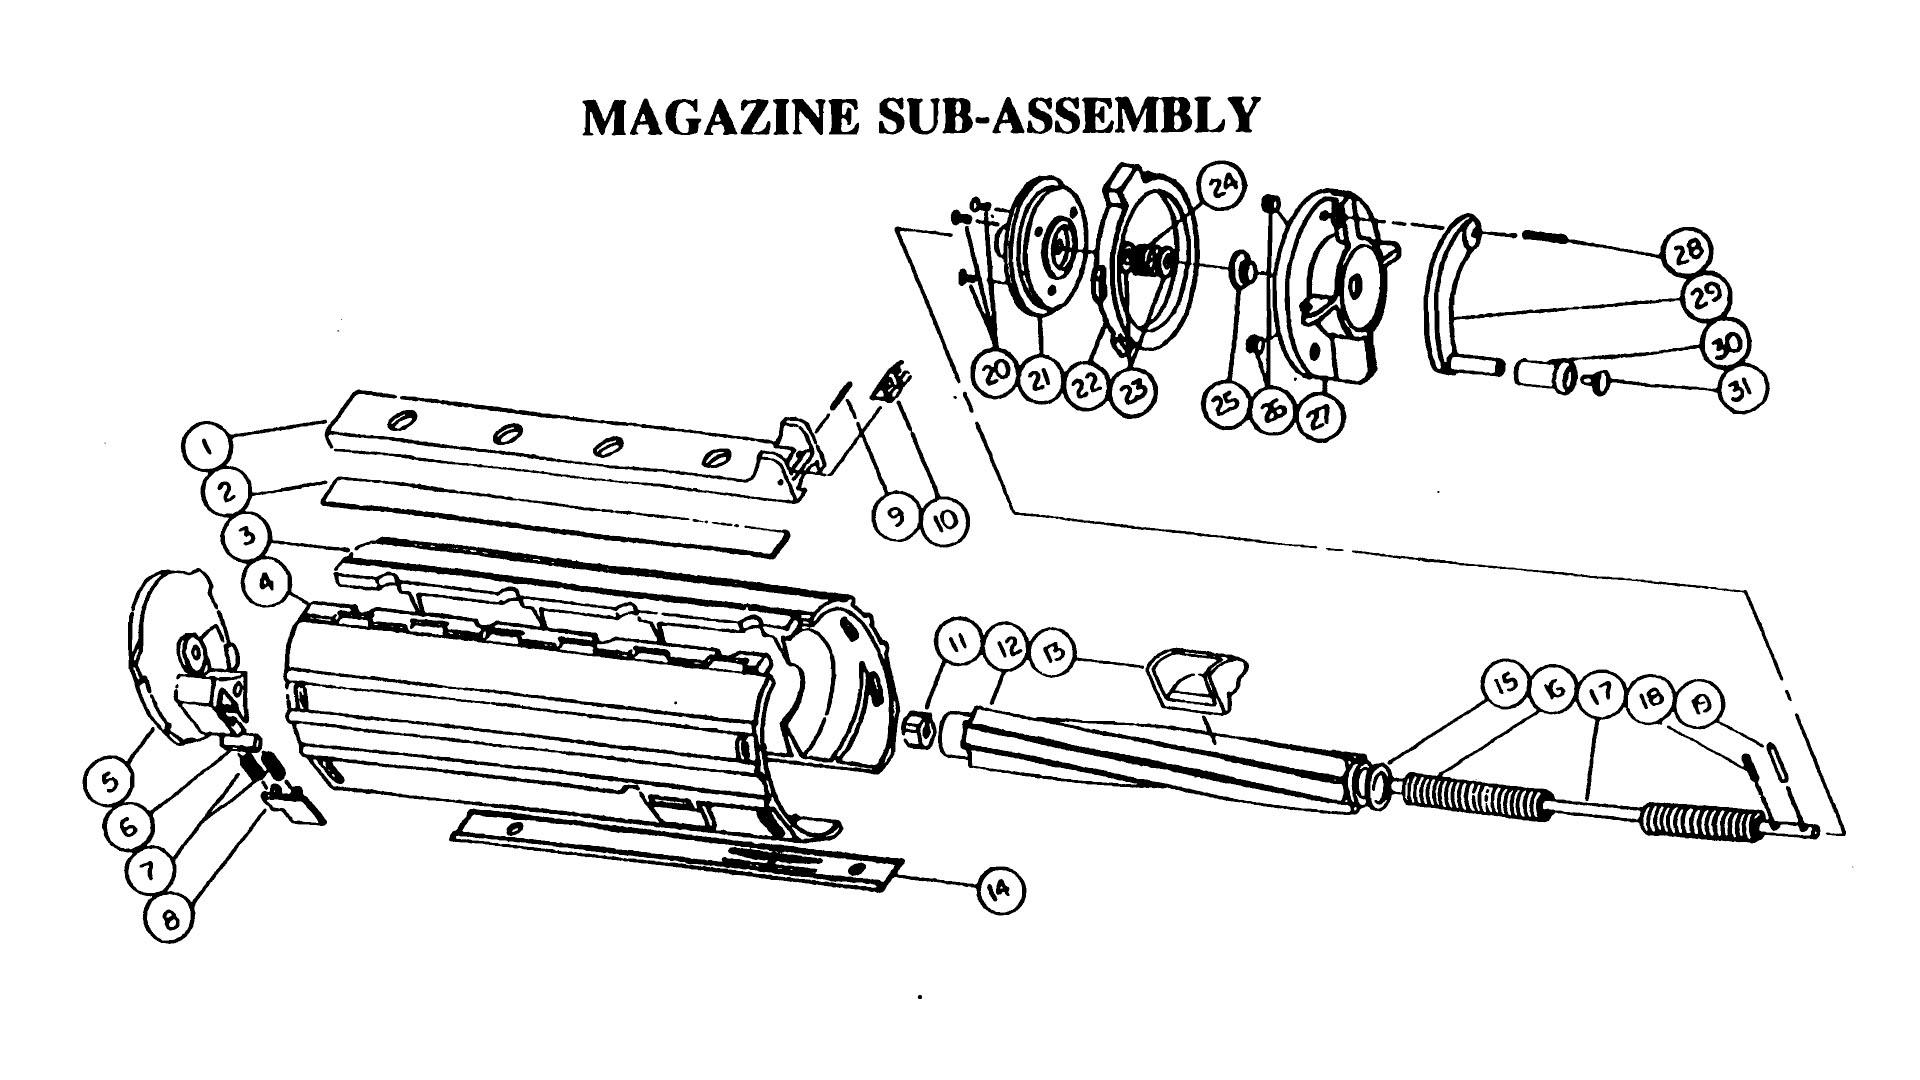 M-806 50Rd Magazine Breakdown